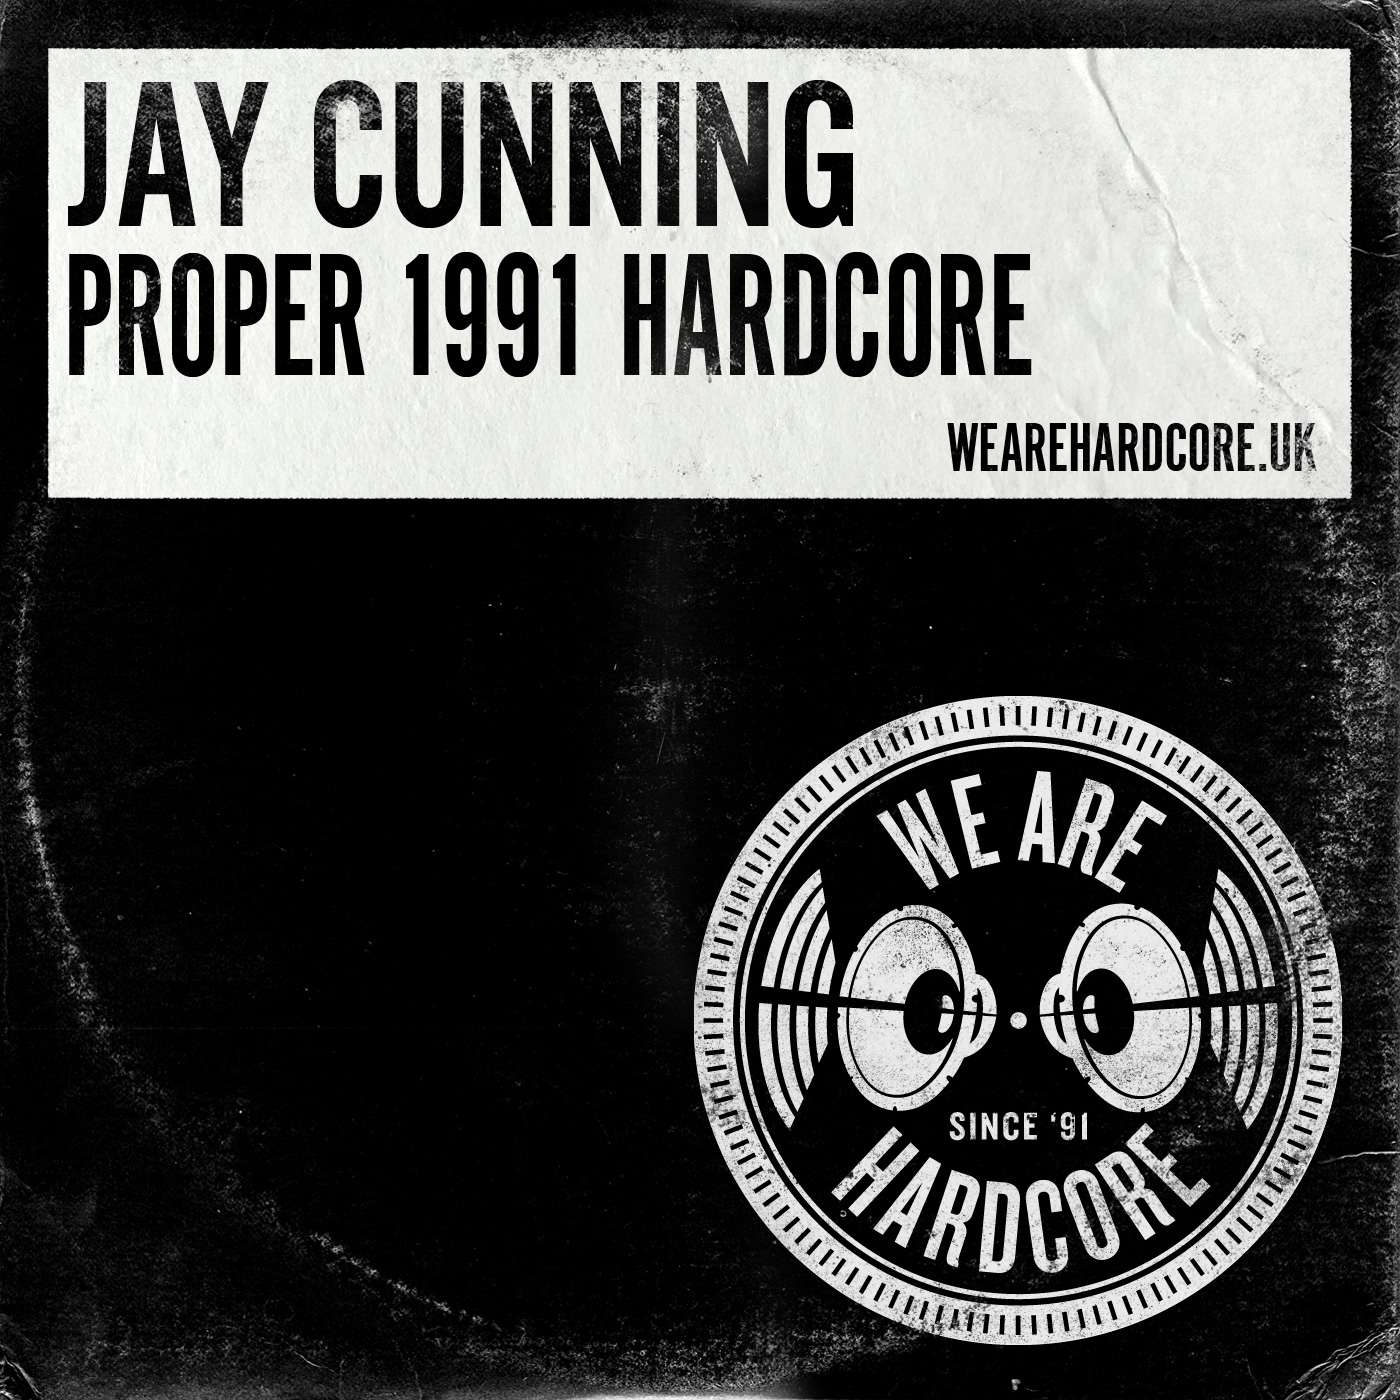 Proper 1991 Hardcore - Jay Cunning WE ARE HARDCORE